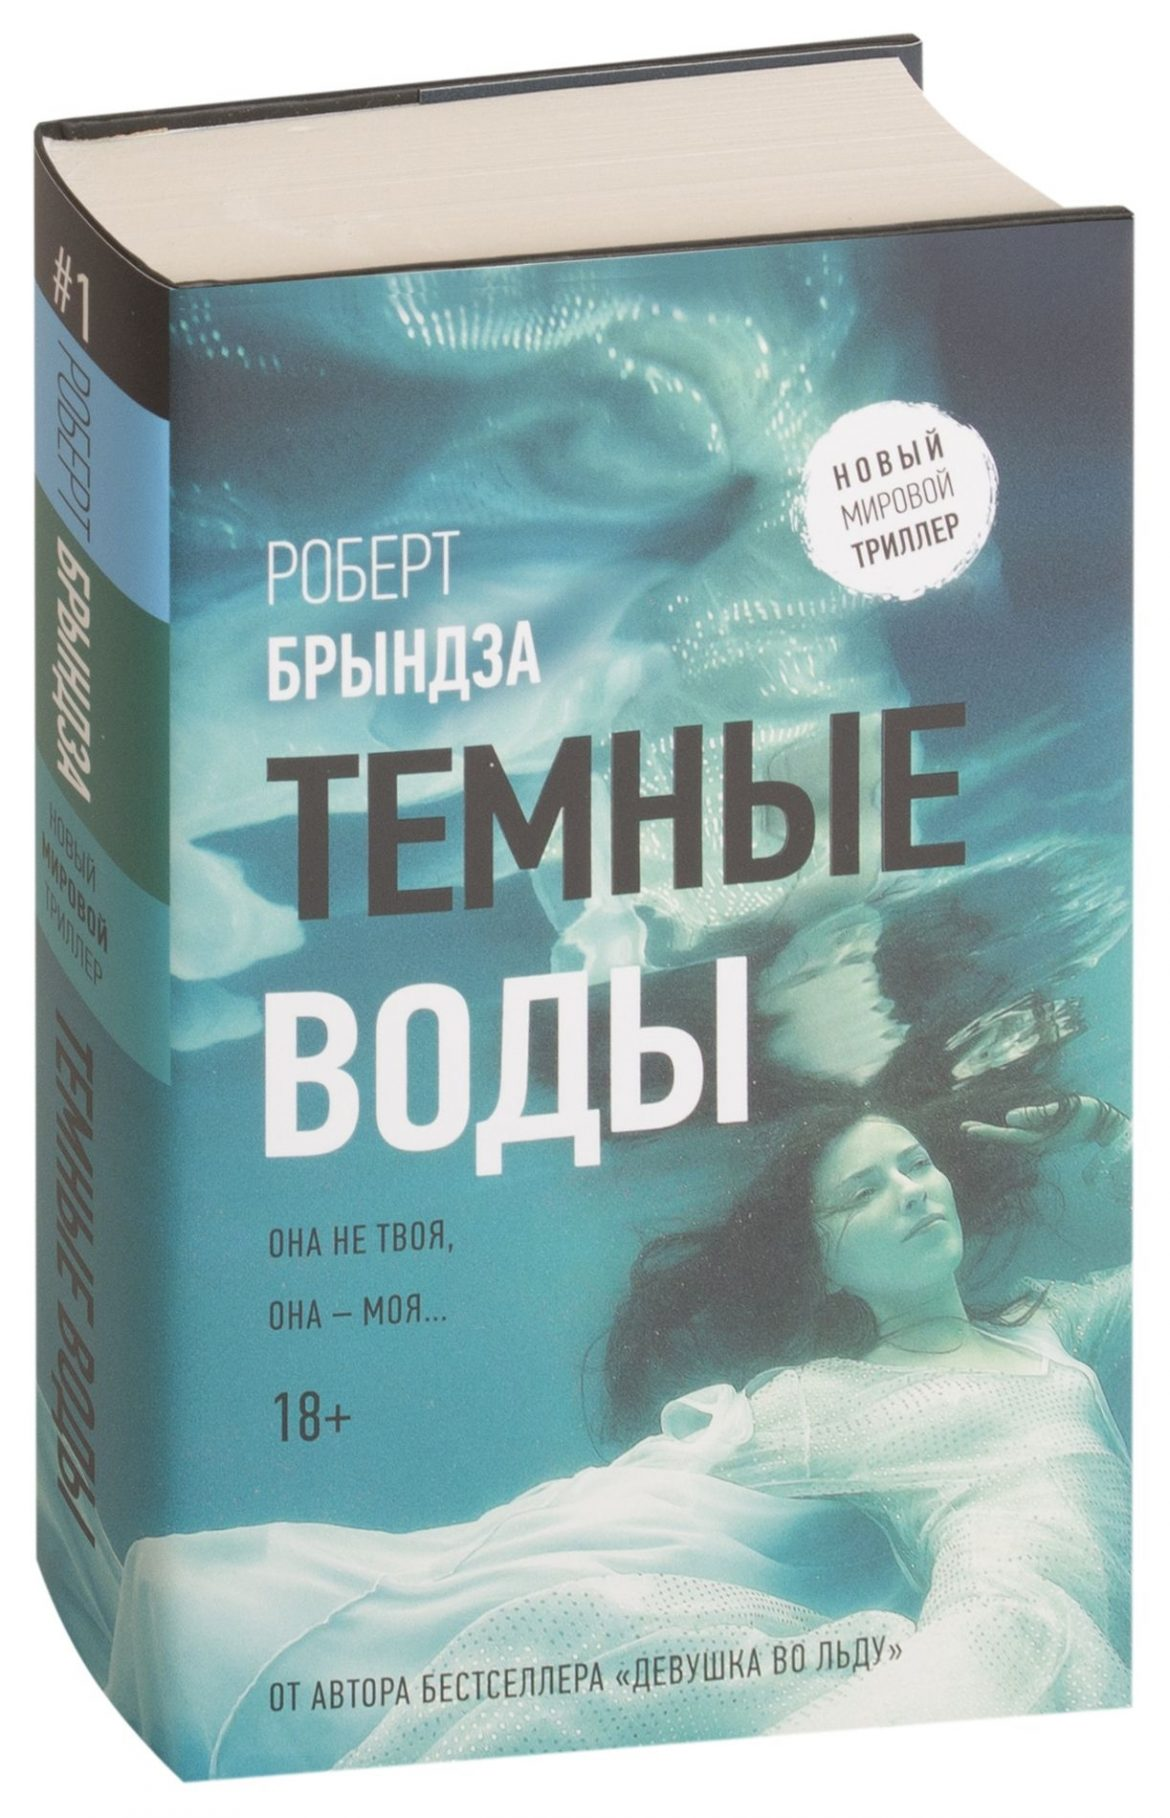 Темные воды — Роберт Брындза